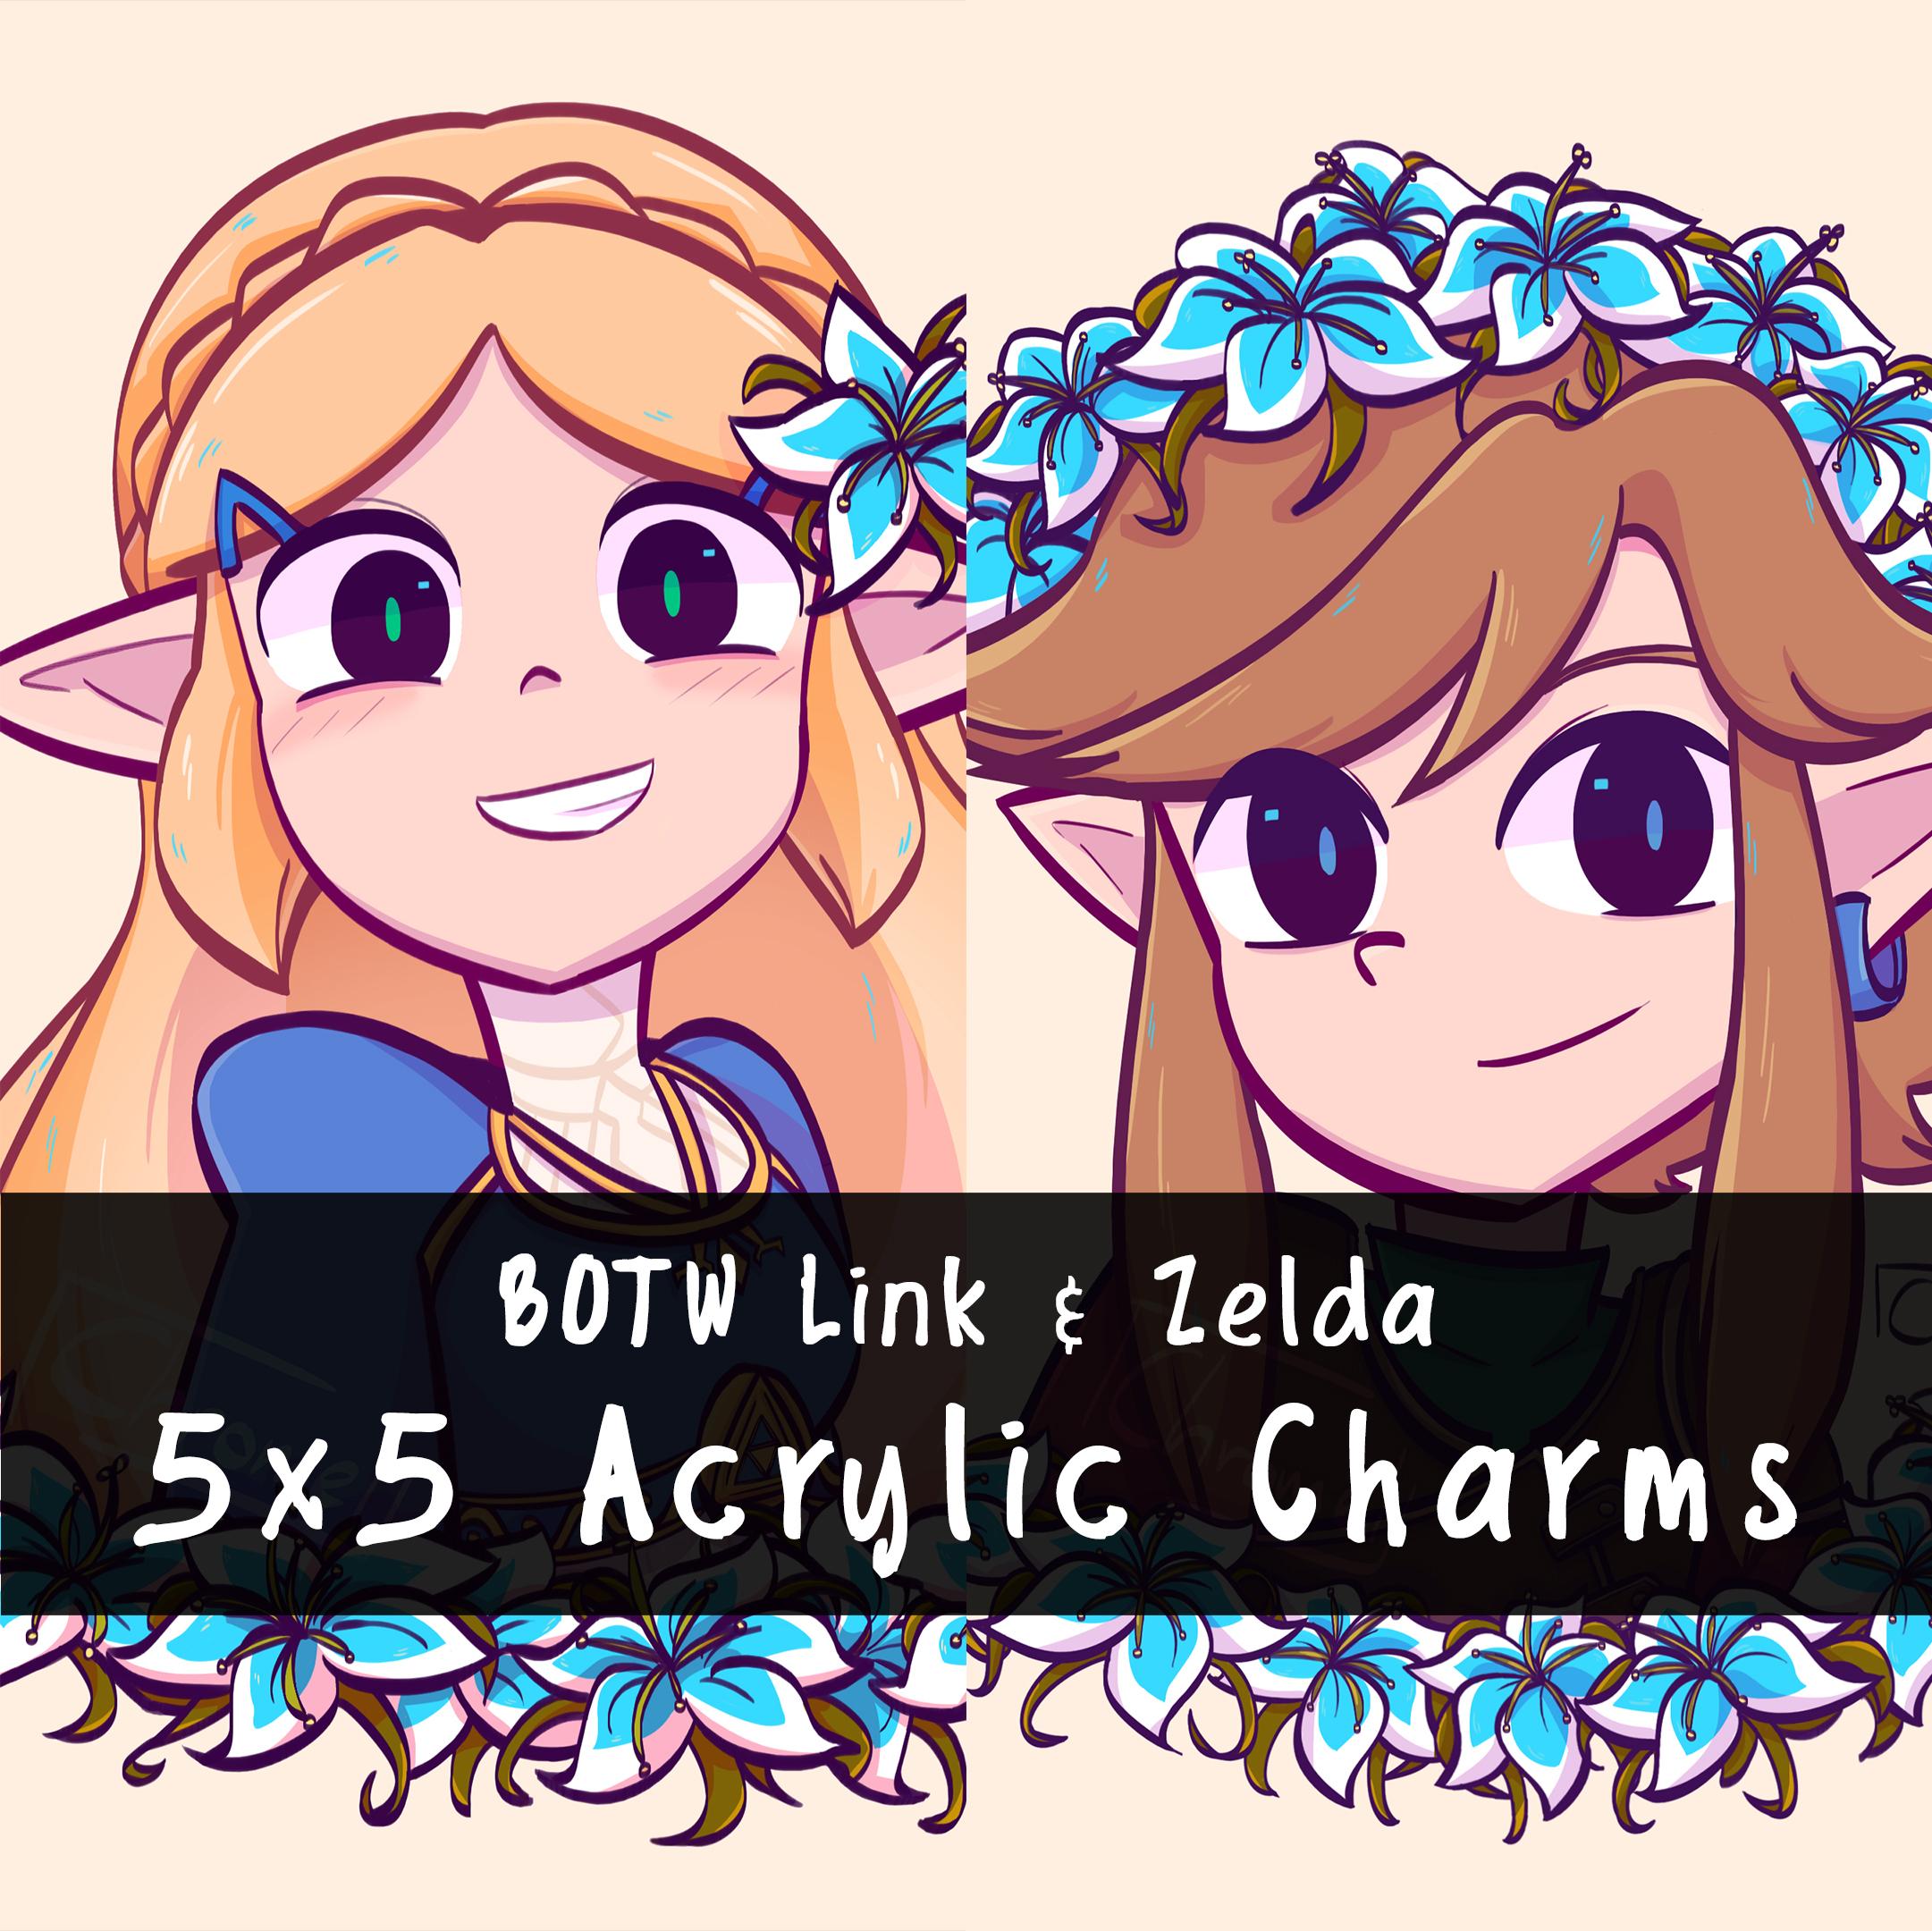 Link Zelda Silent Princess Flower Crown Acrylic Charms